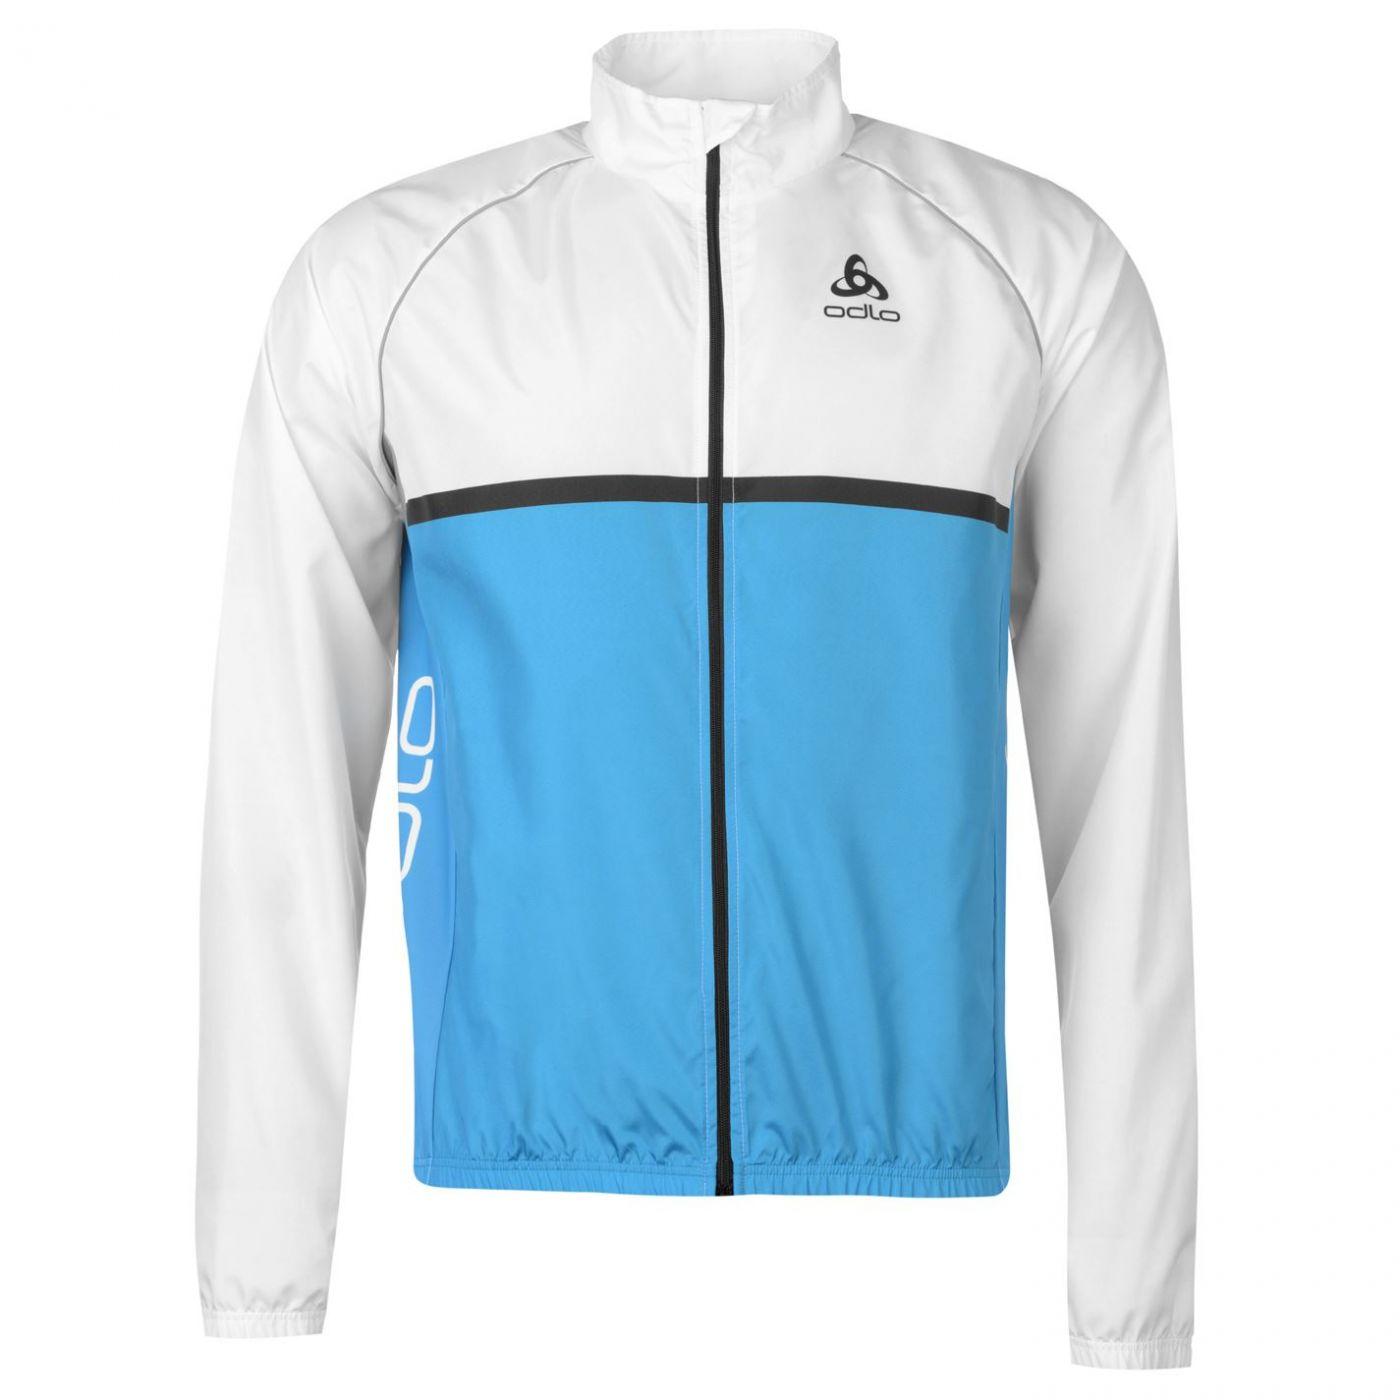 Odlo Cycling Jacket